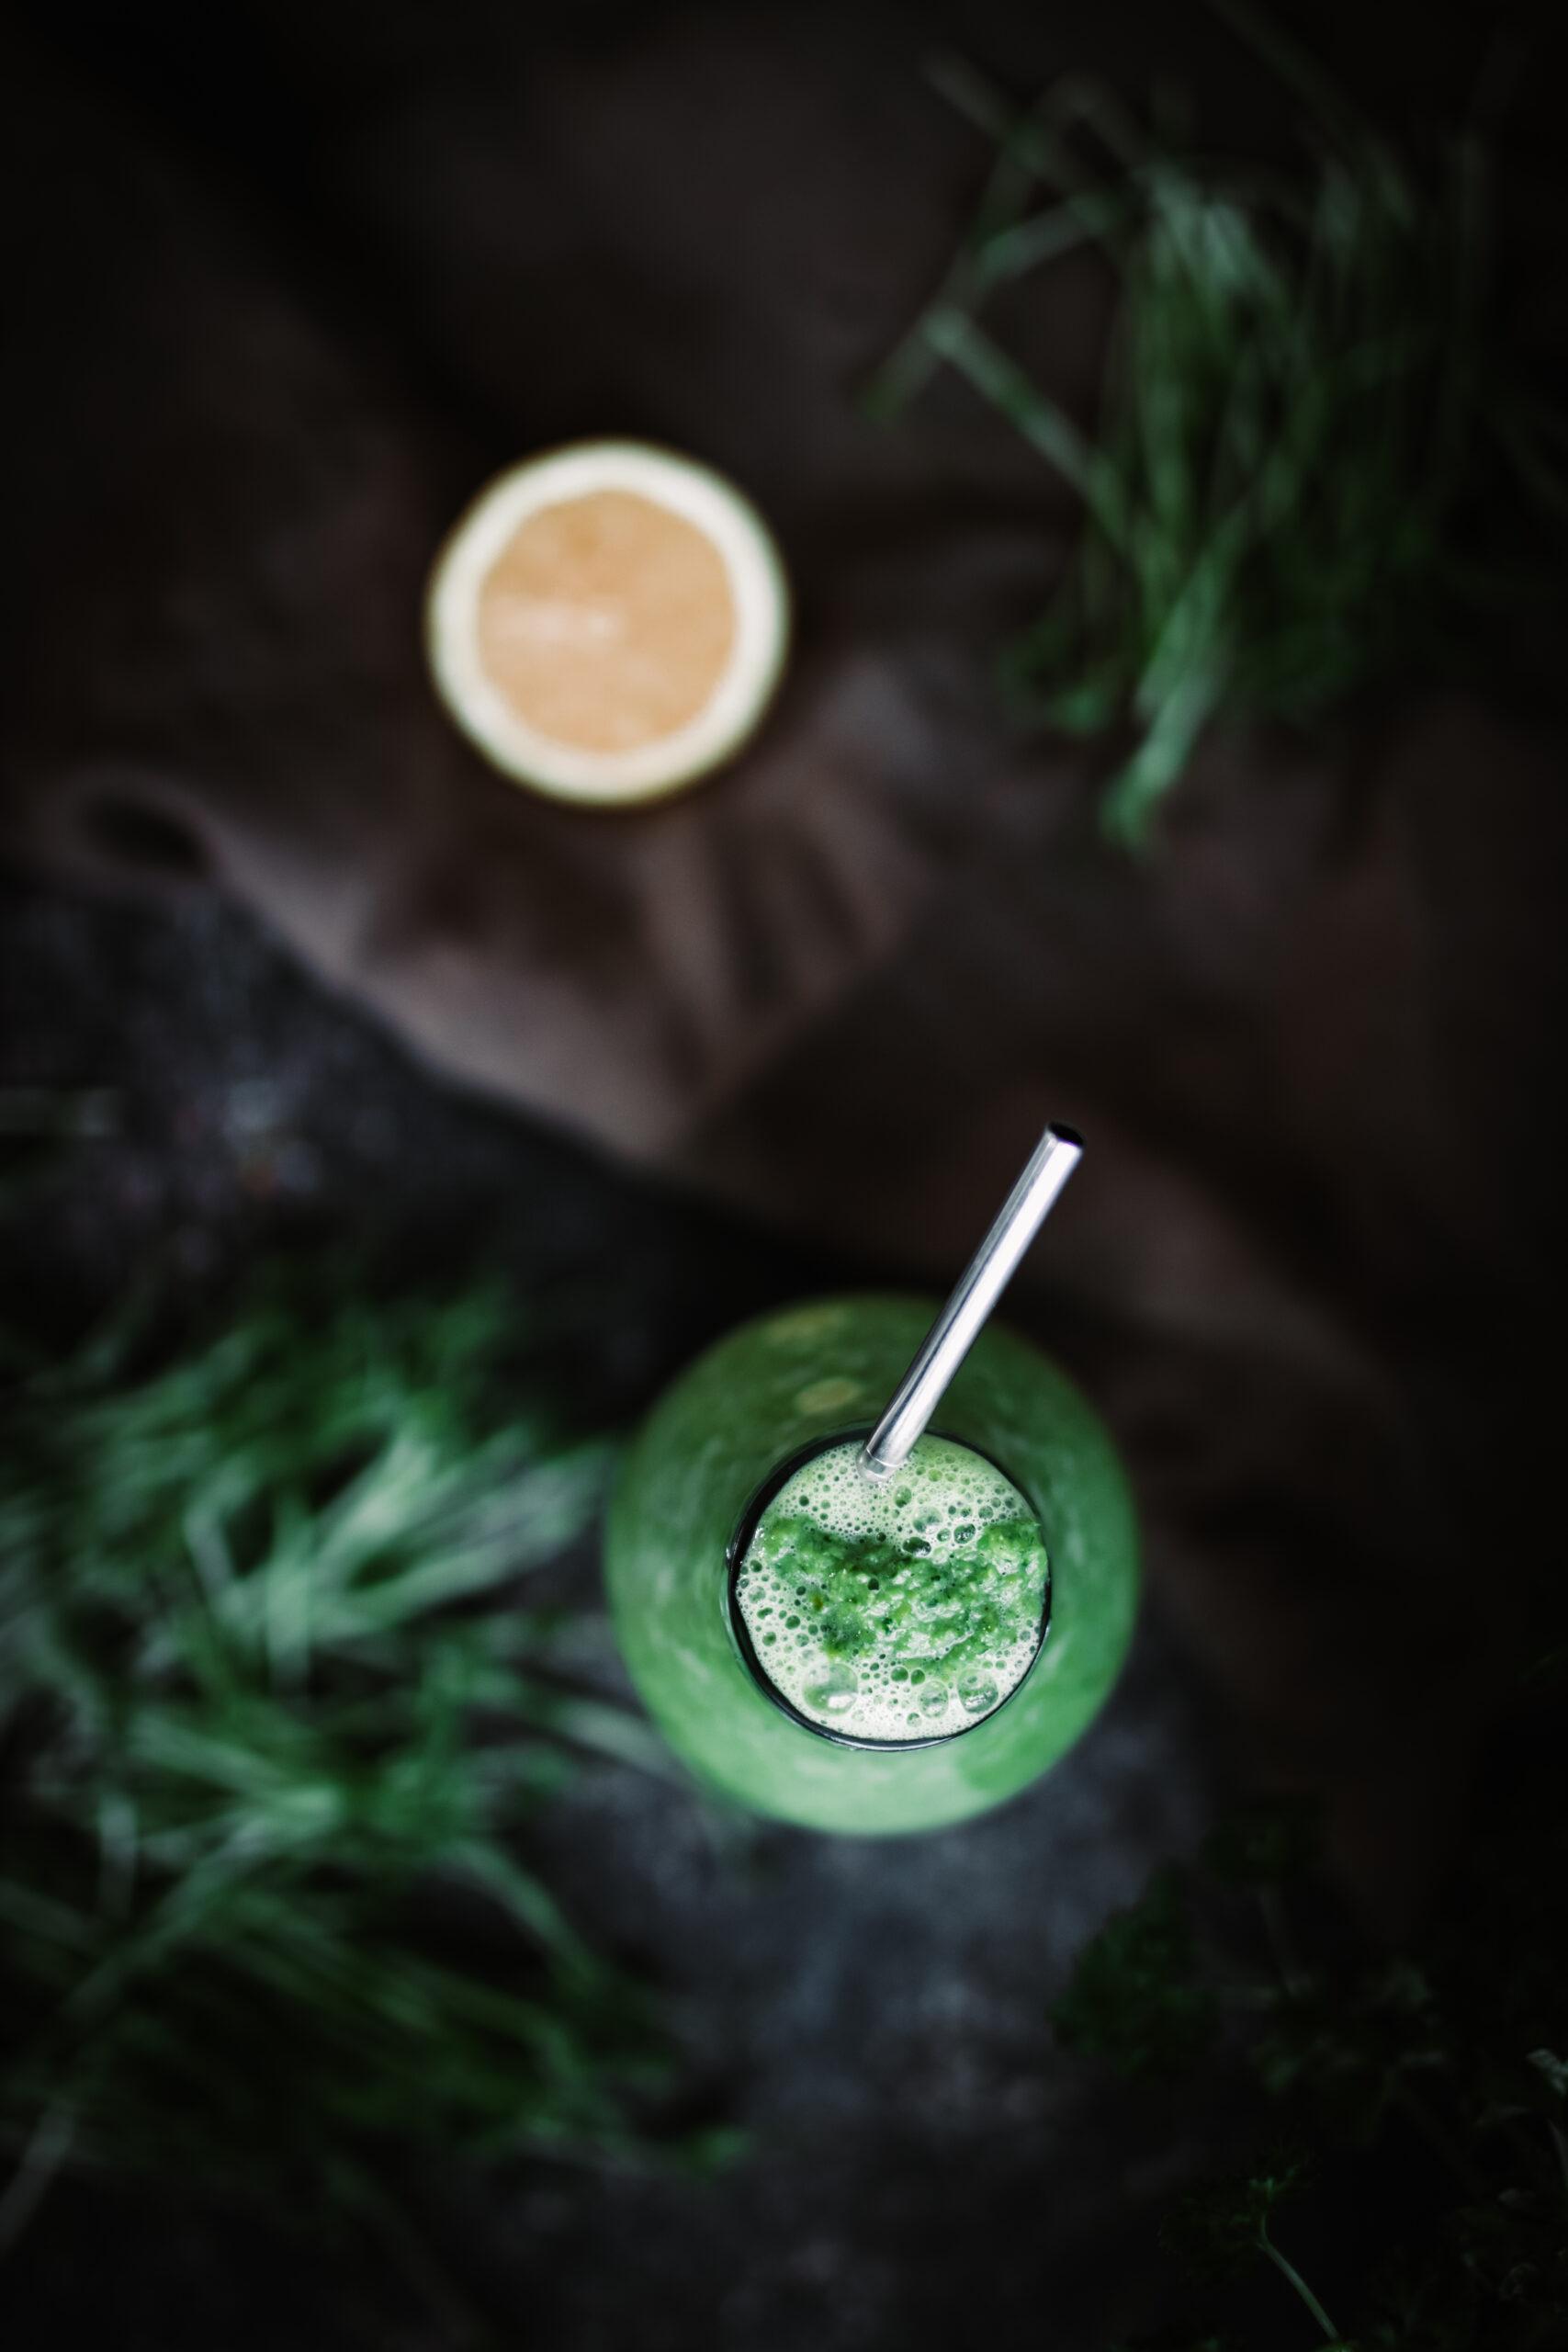 Grön ärtsmoothie